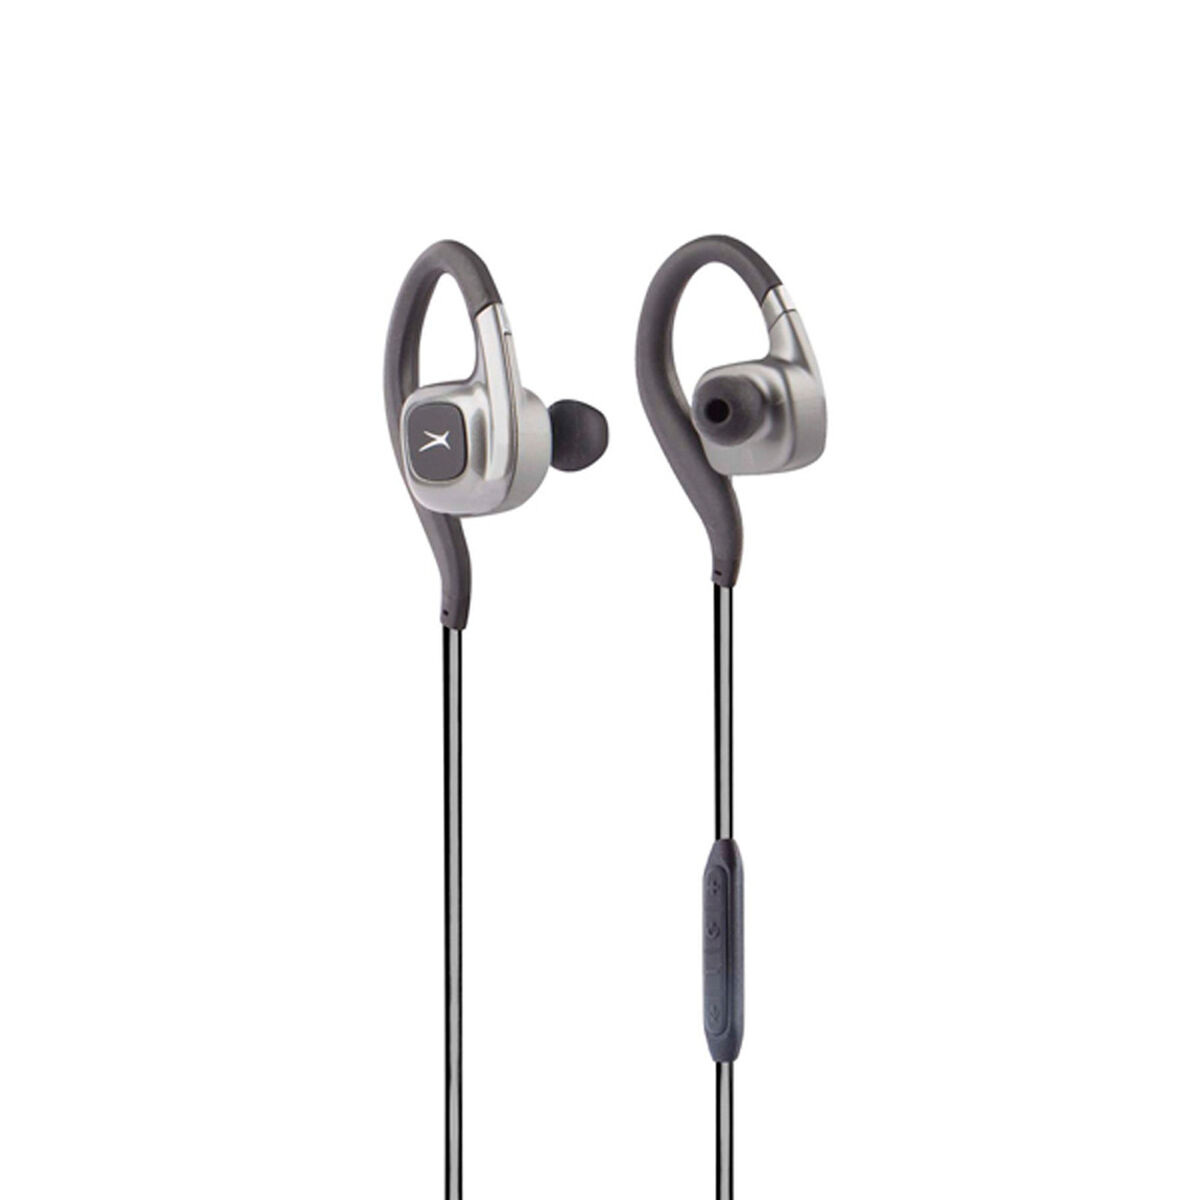 Audífonos Altec Lansing MZX500 BLK Negro